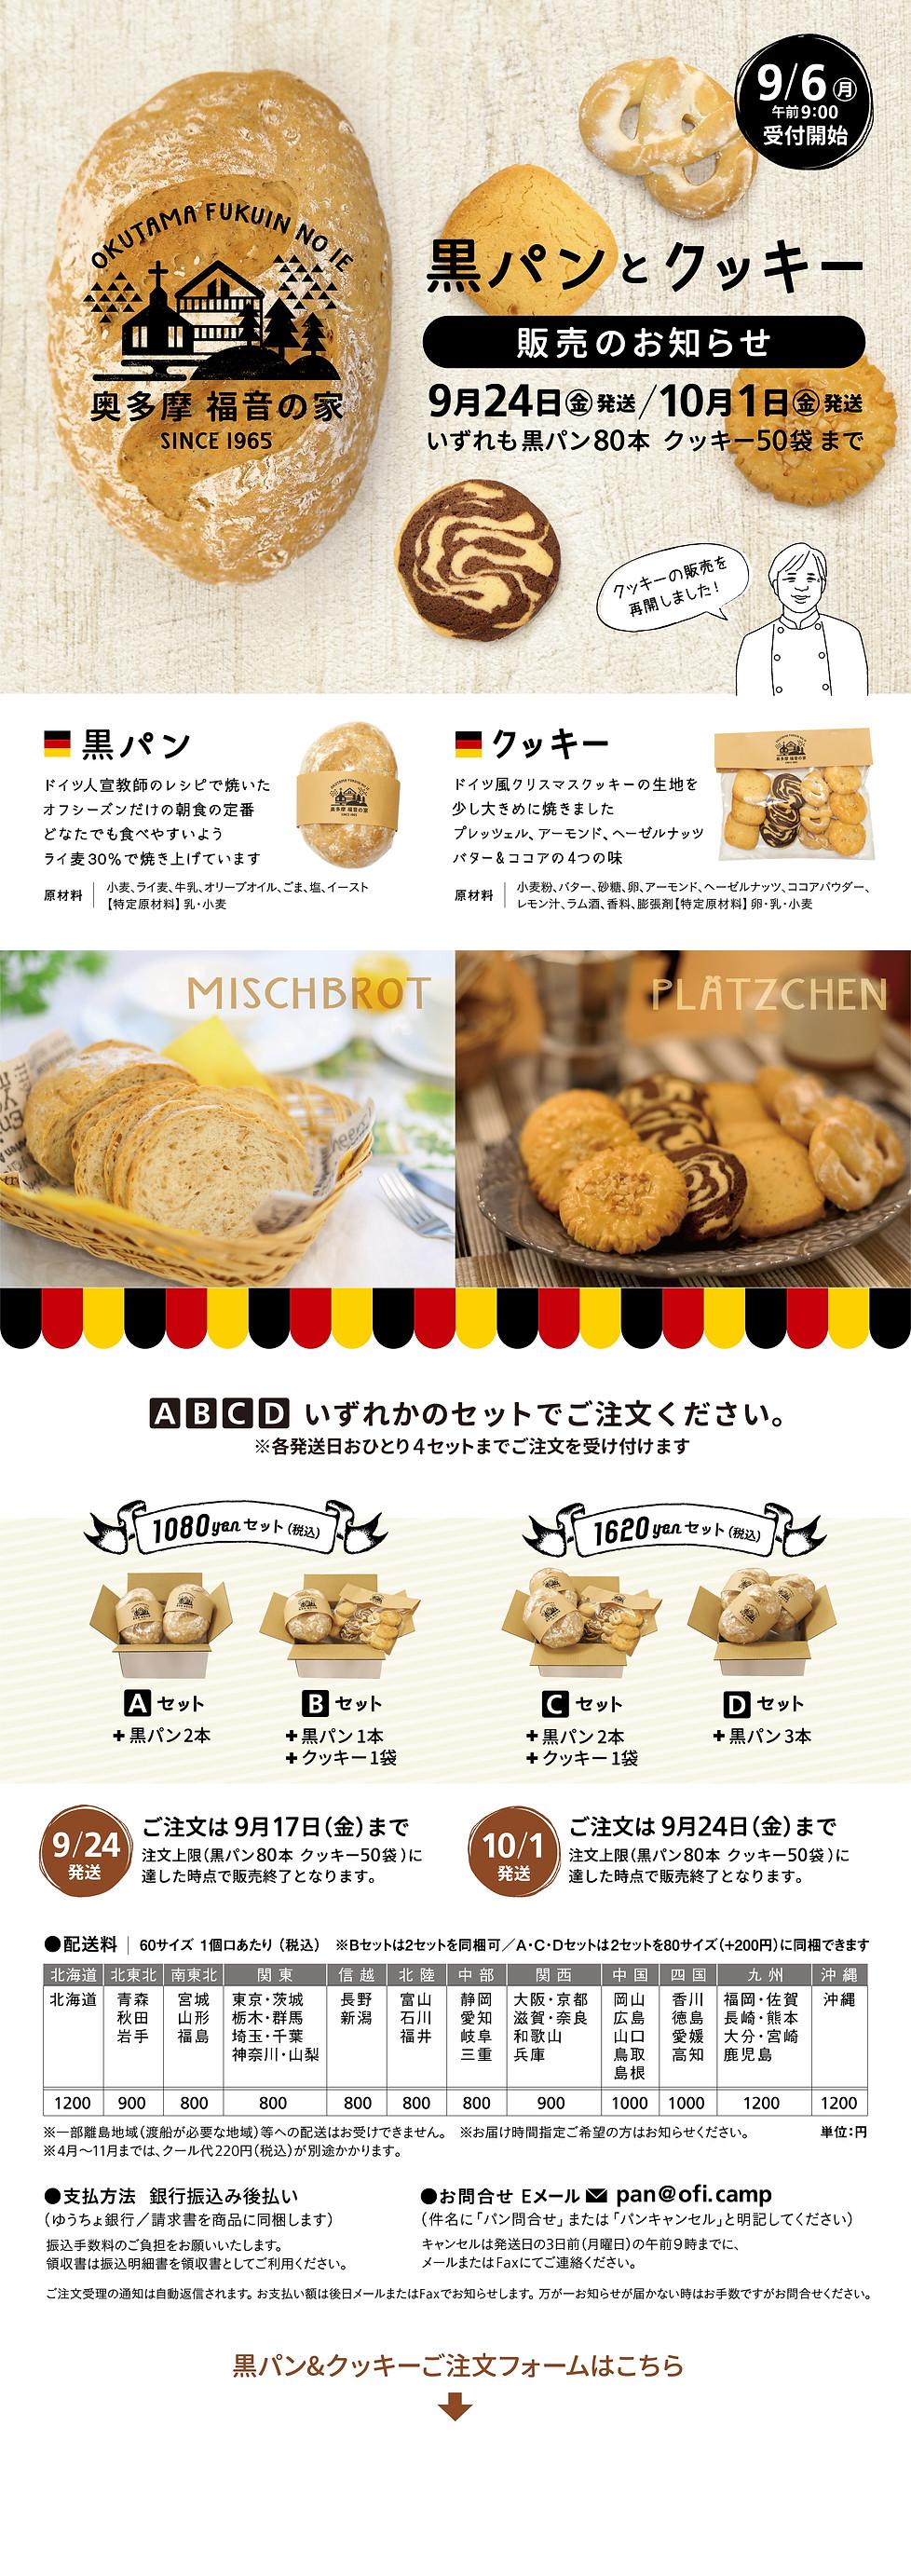 OFI_panandcookie_202109_web.jpg